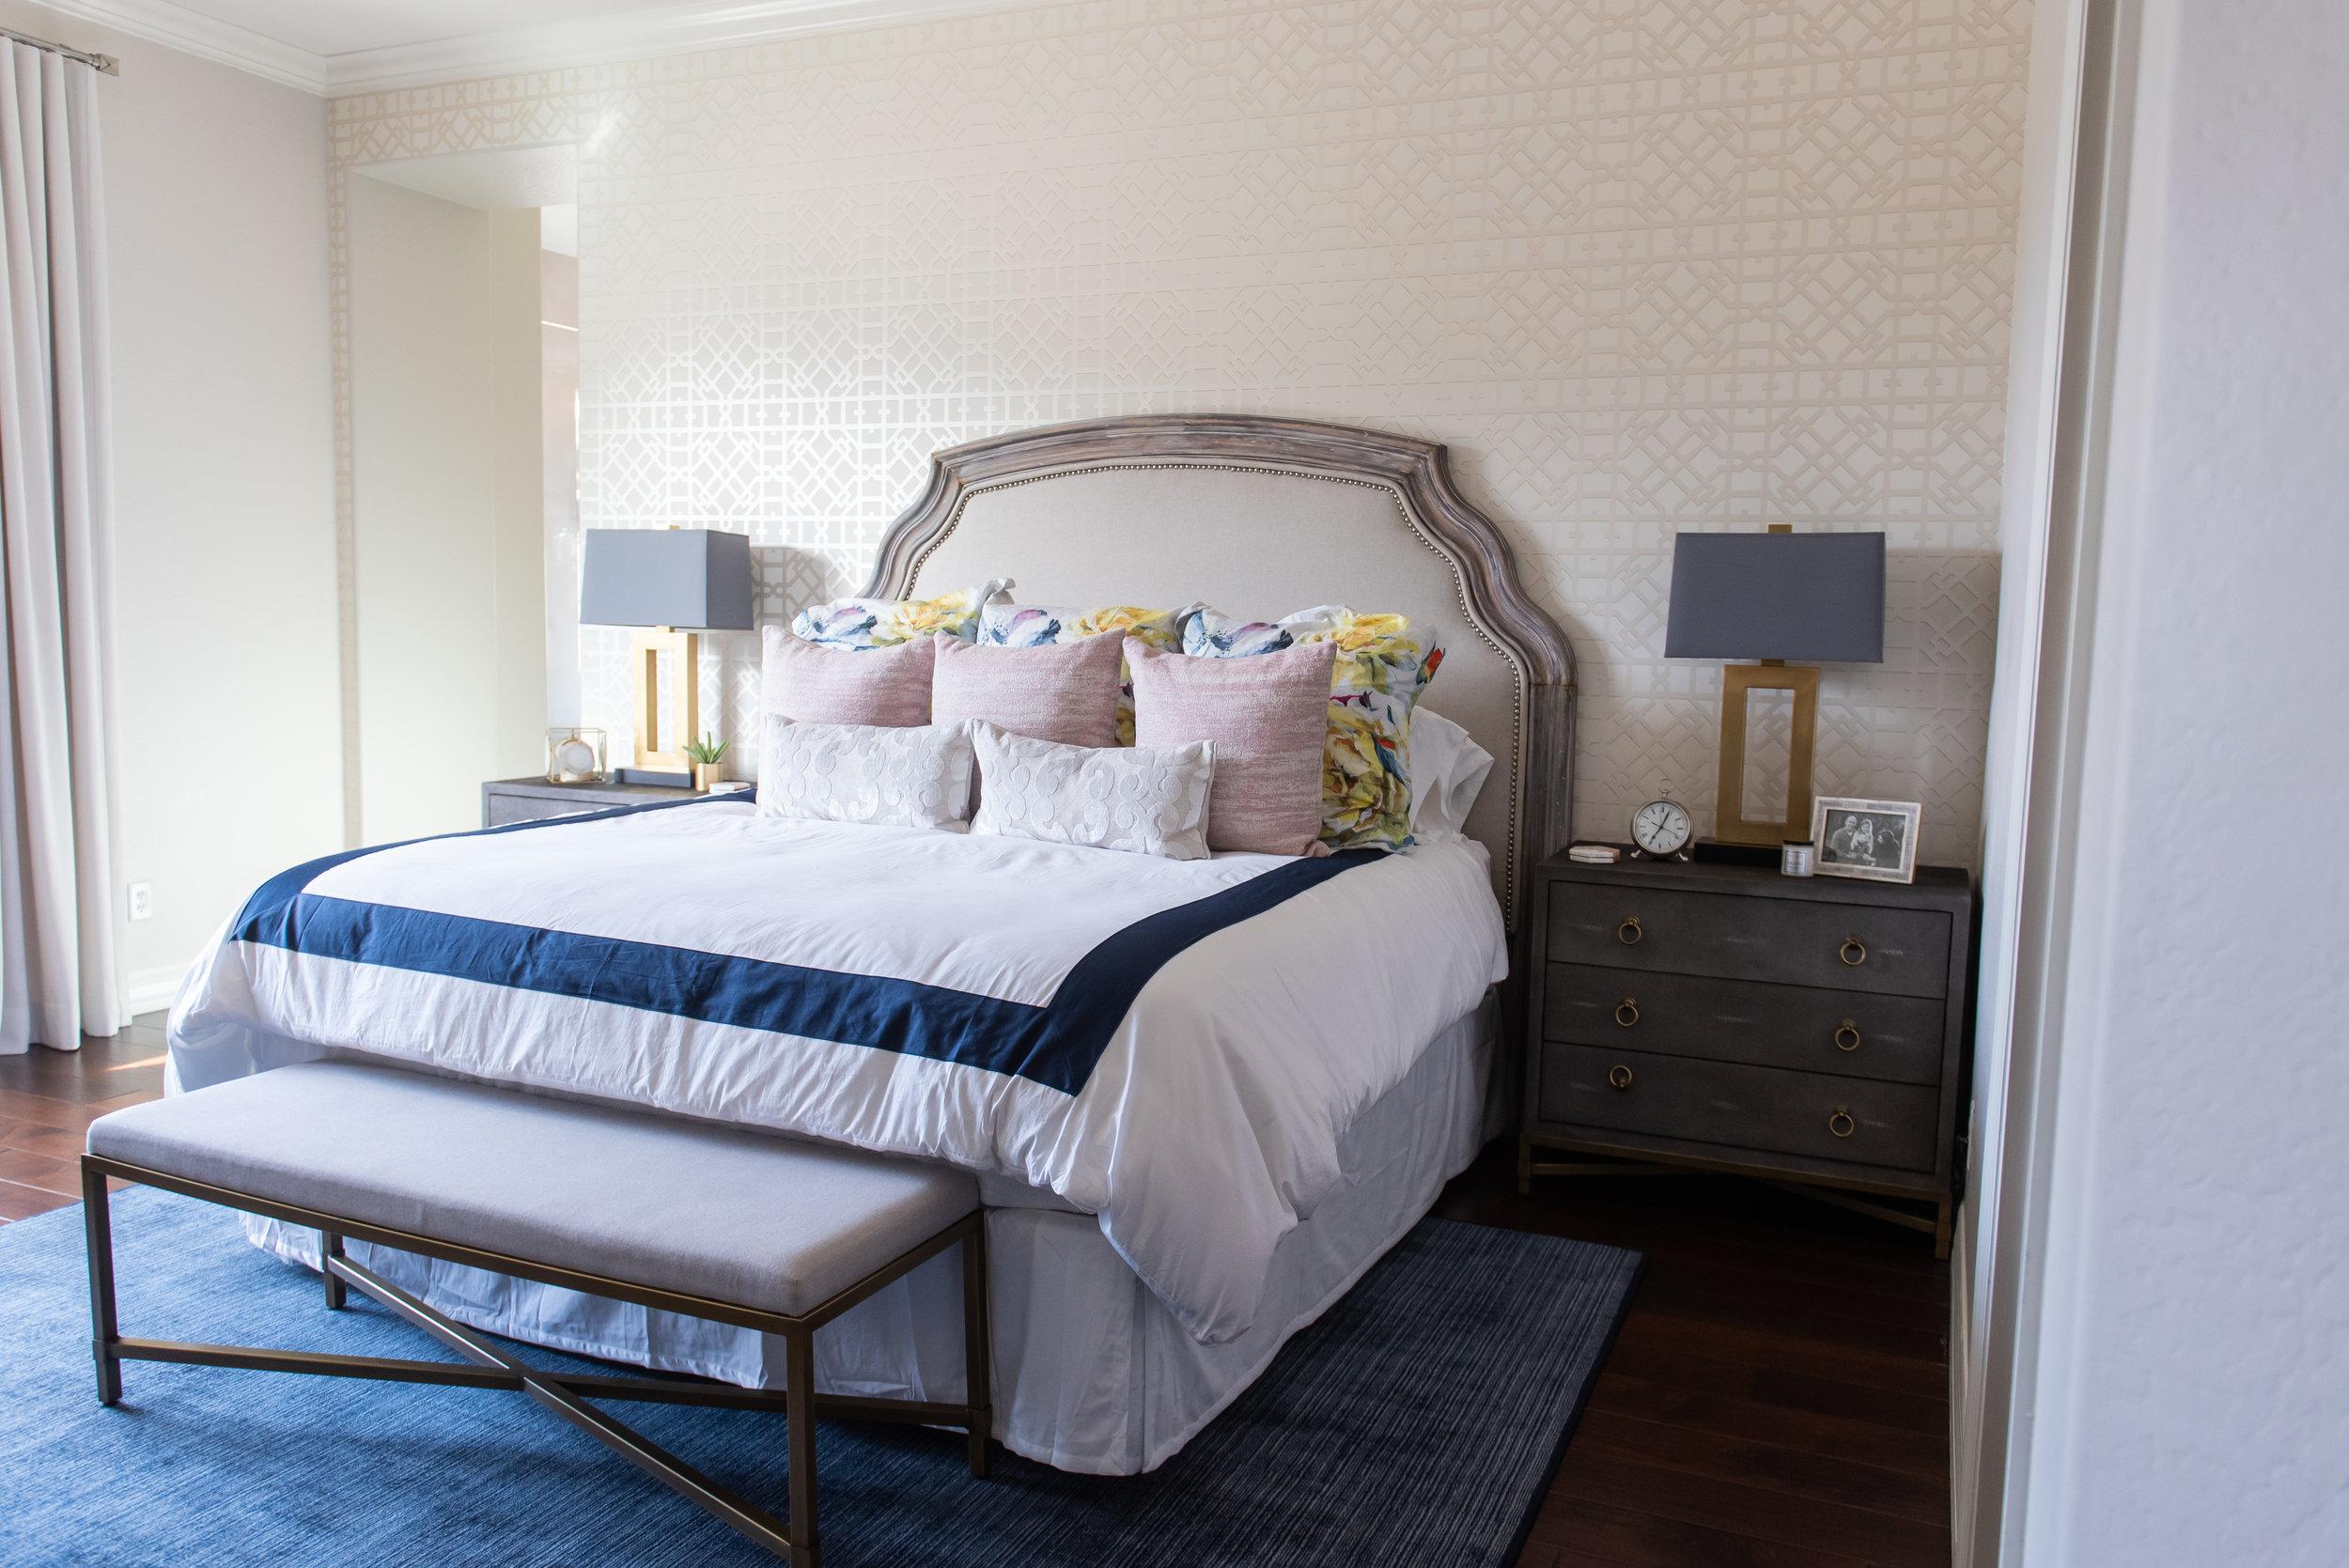 Master bedroom +lamp +nightstand +throw pillows +bedding +wallpaper +headboard +bench +rug.jpg